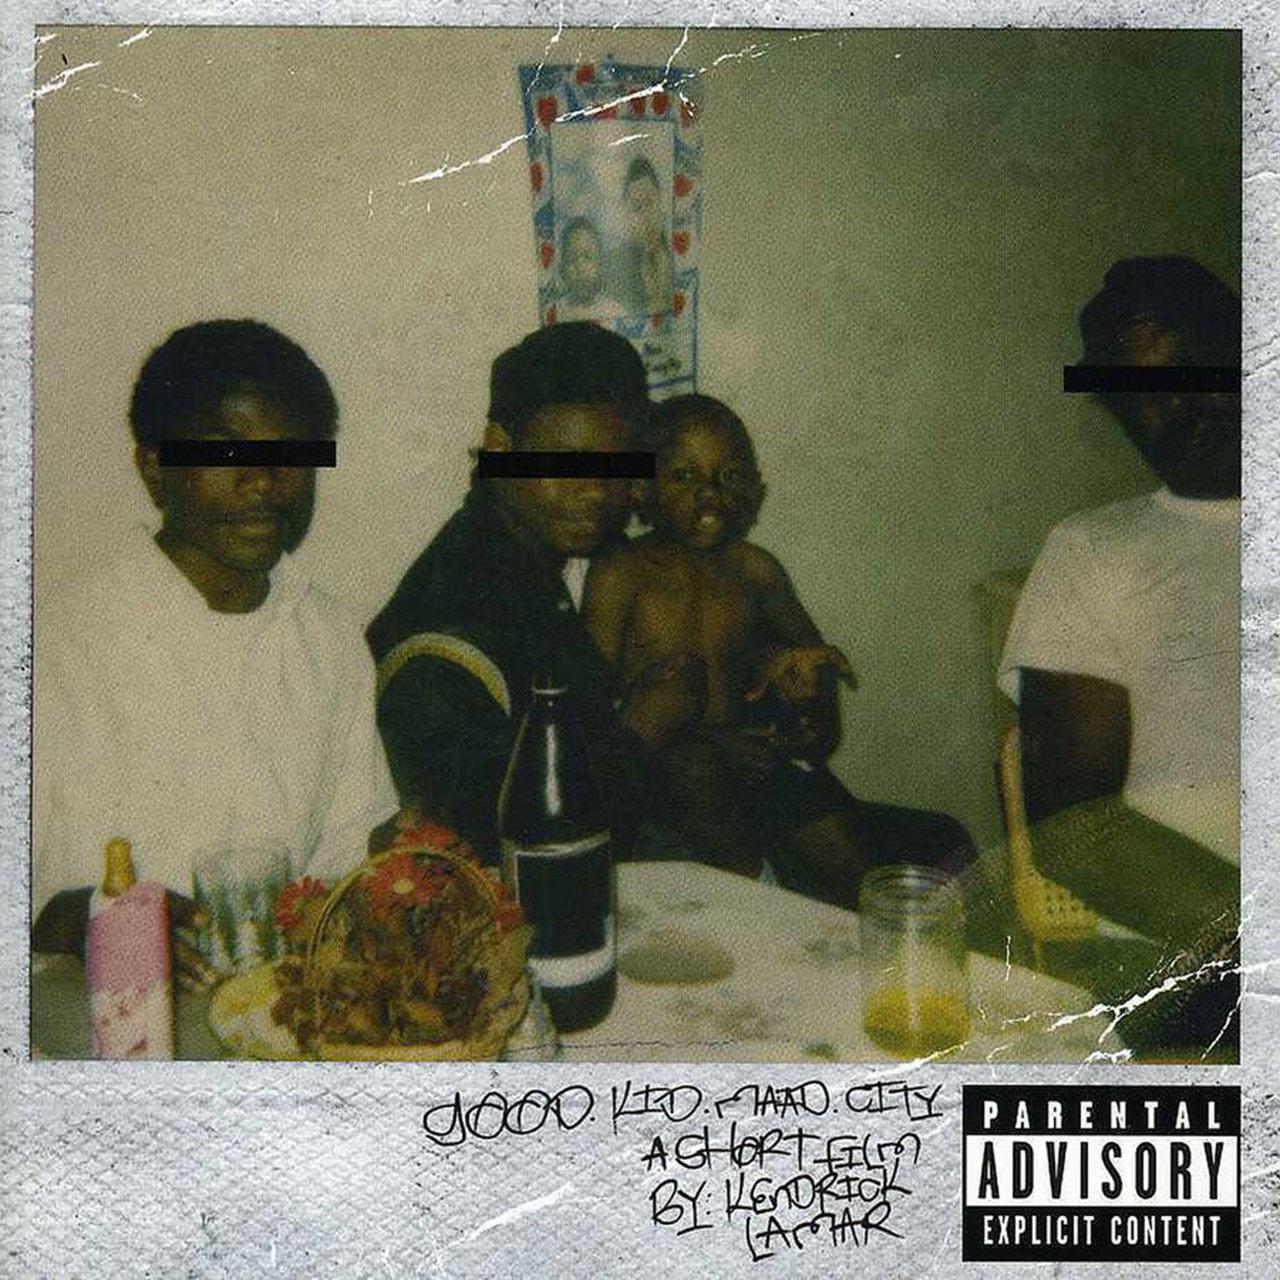 Good Kid, M.A.A.d City: With Remixes - 1